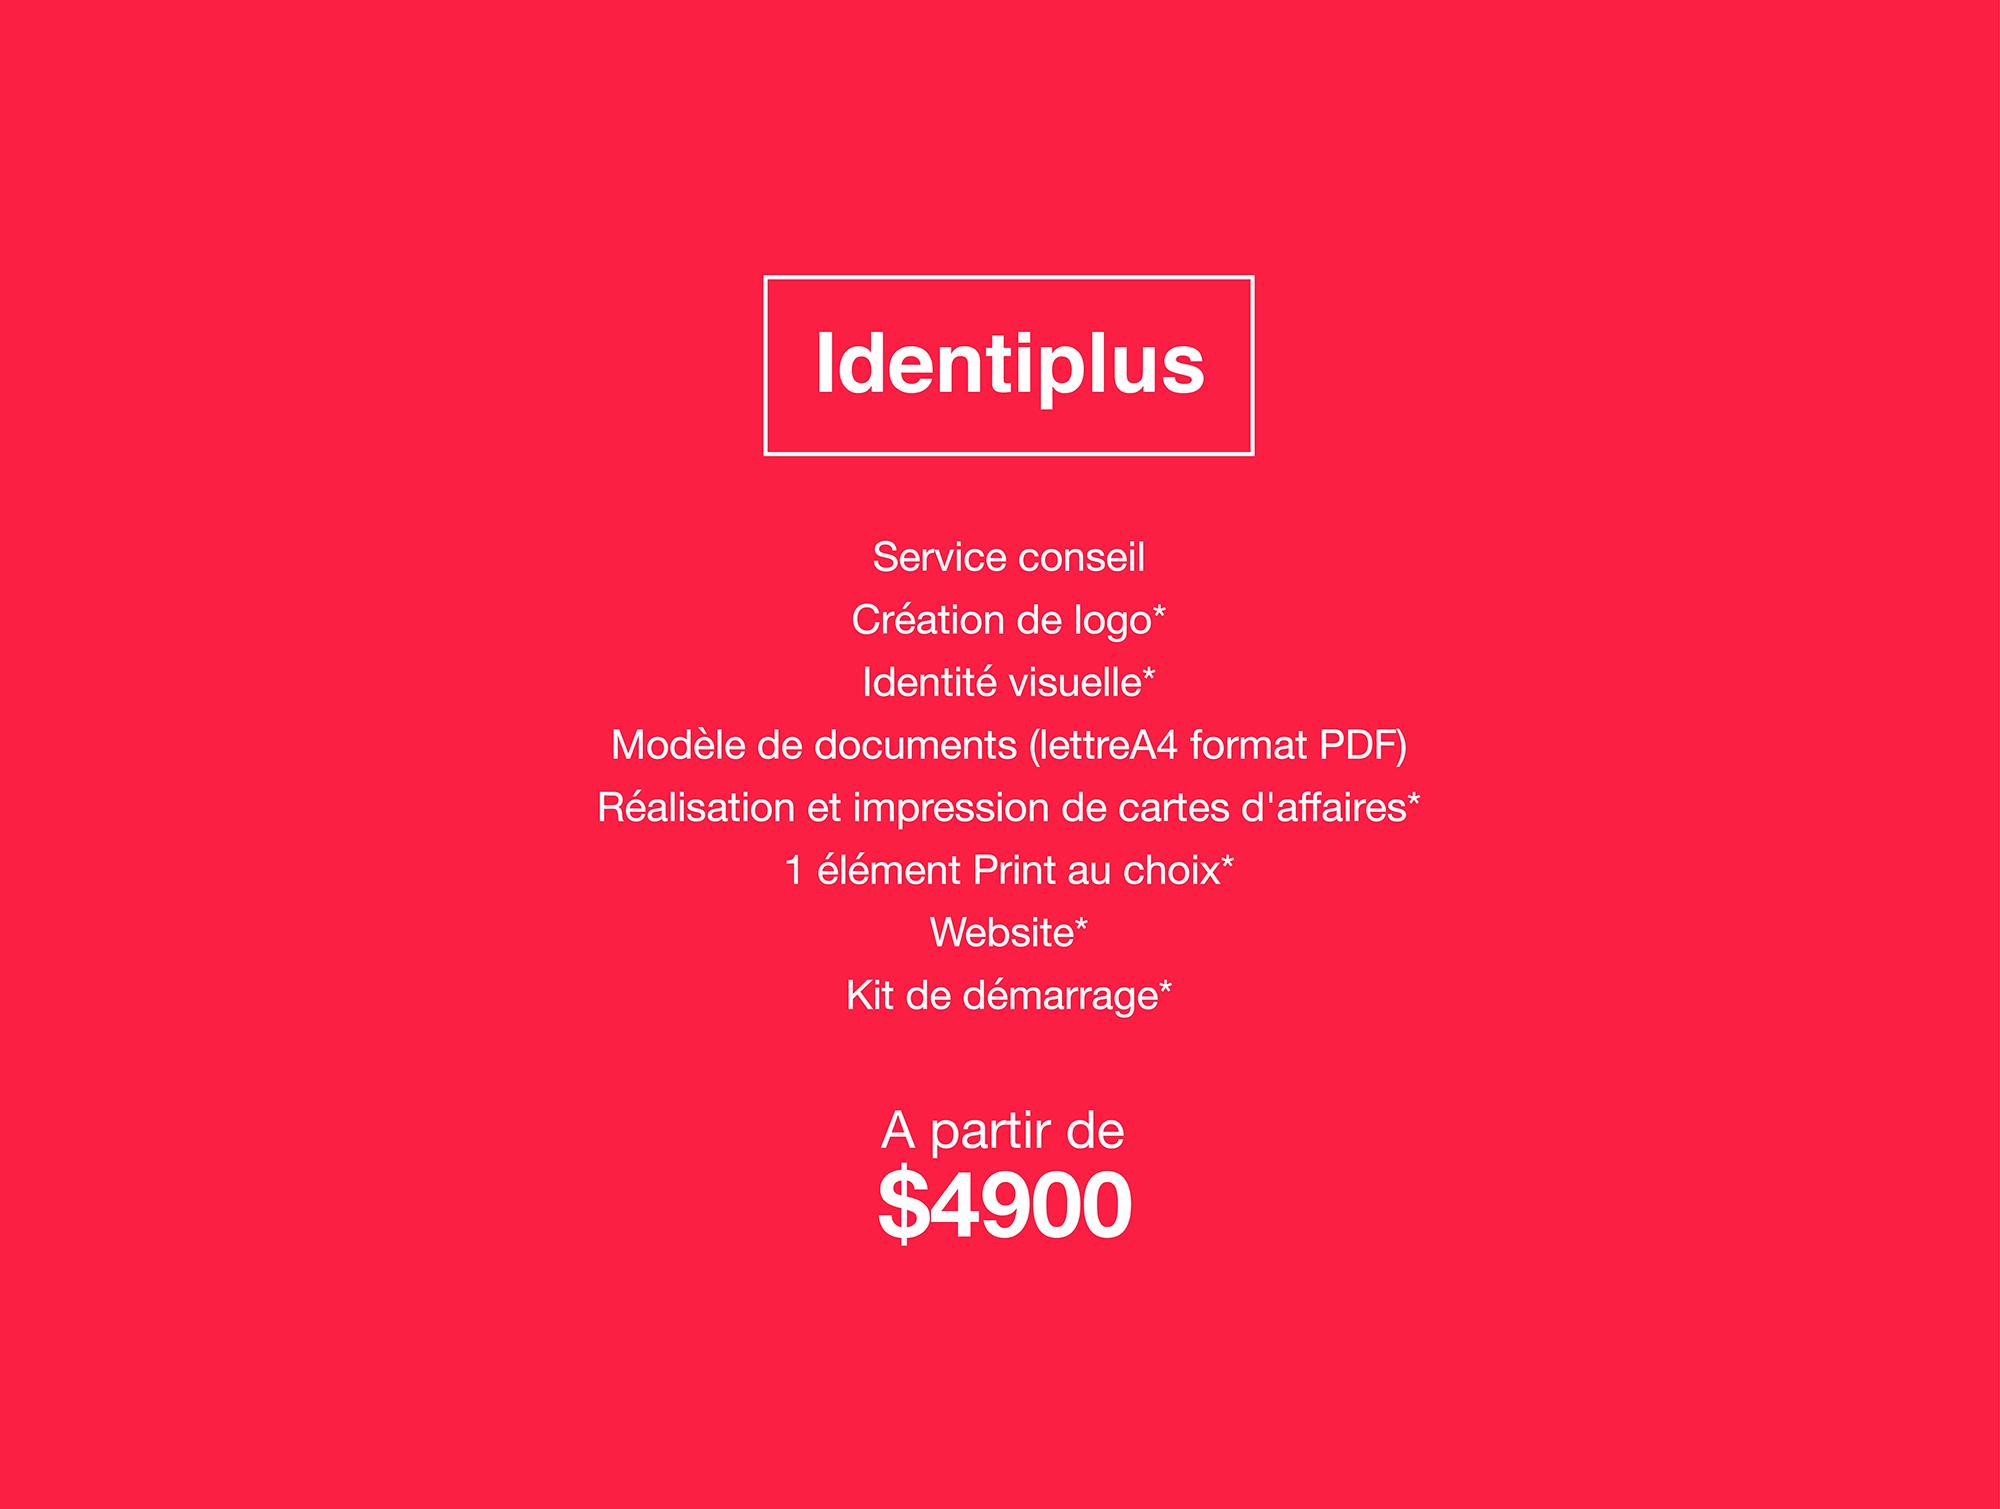 Identiplus_Color_2000X1000.png